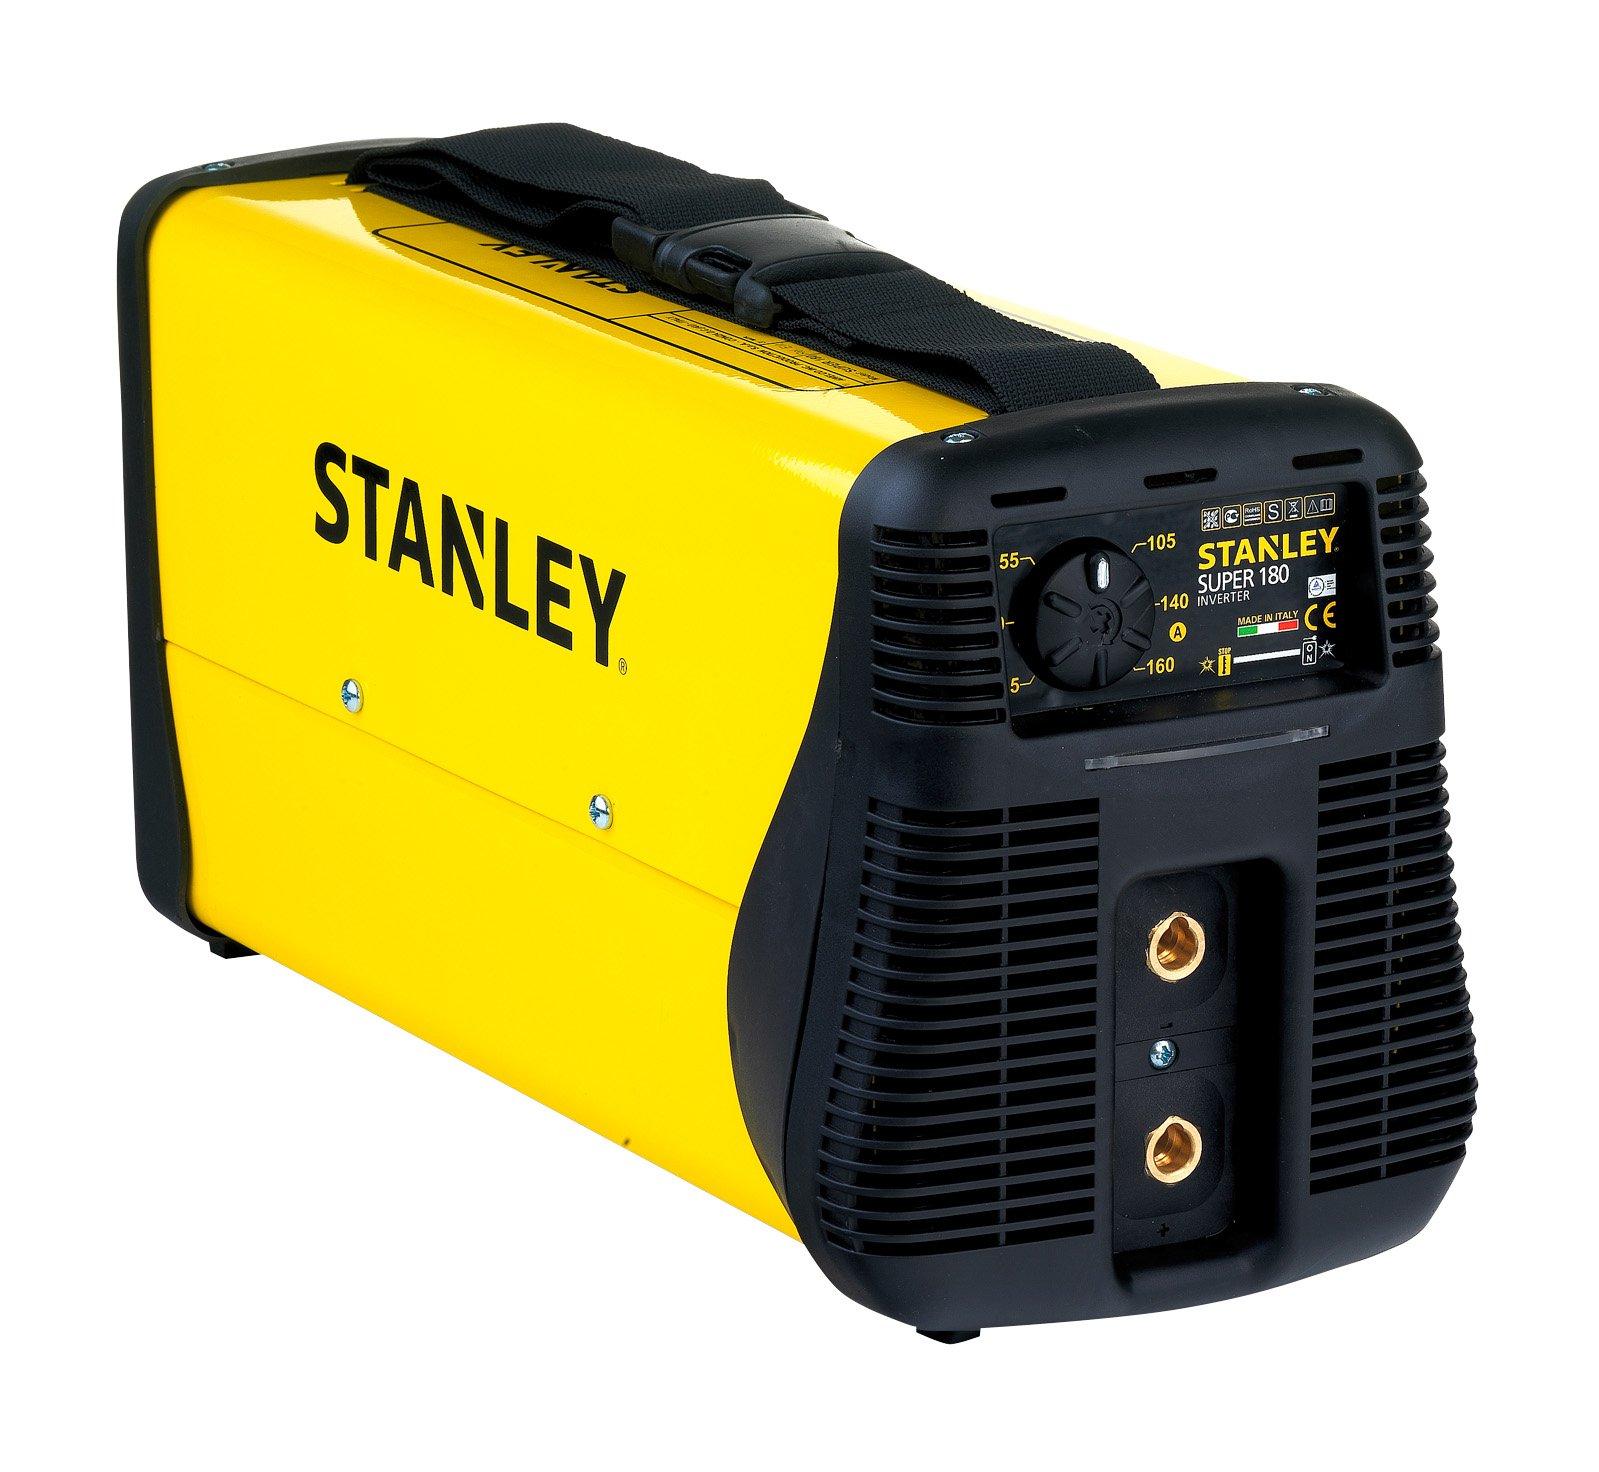 Stanley 460180 Inverter - Equipo de soldadura (160 A) product image